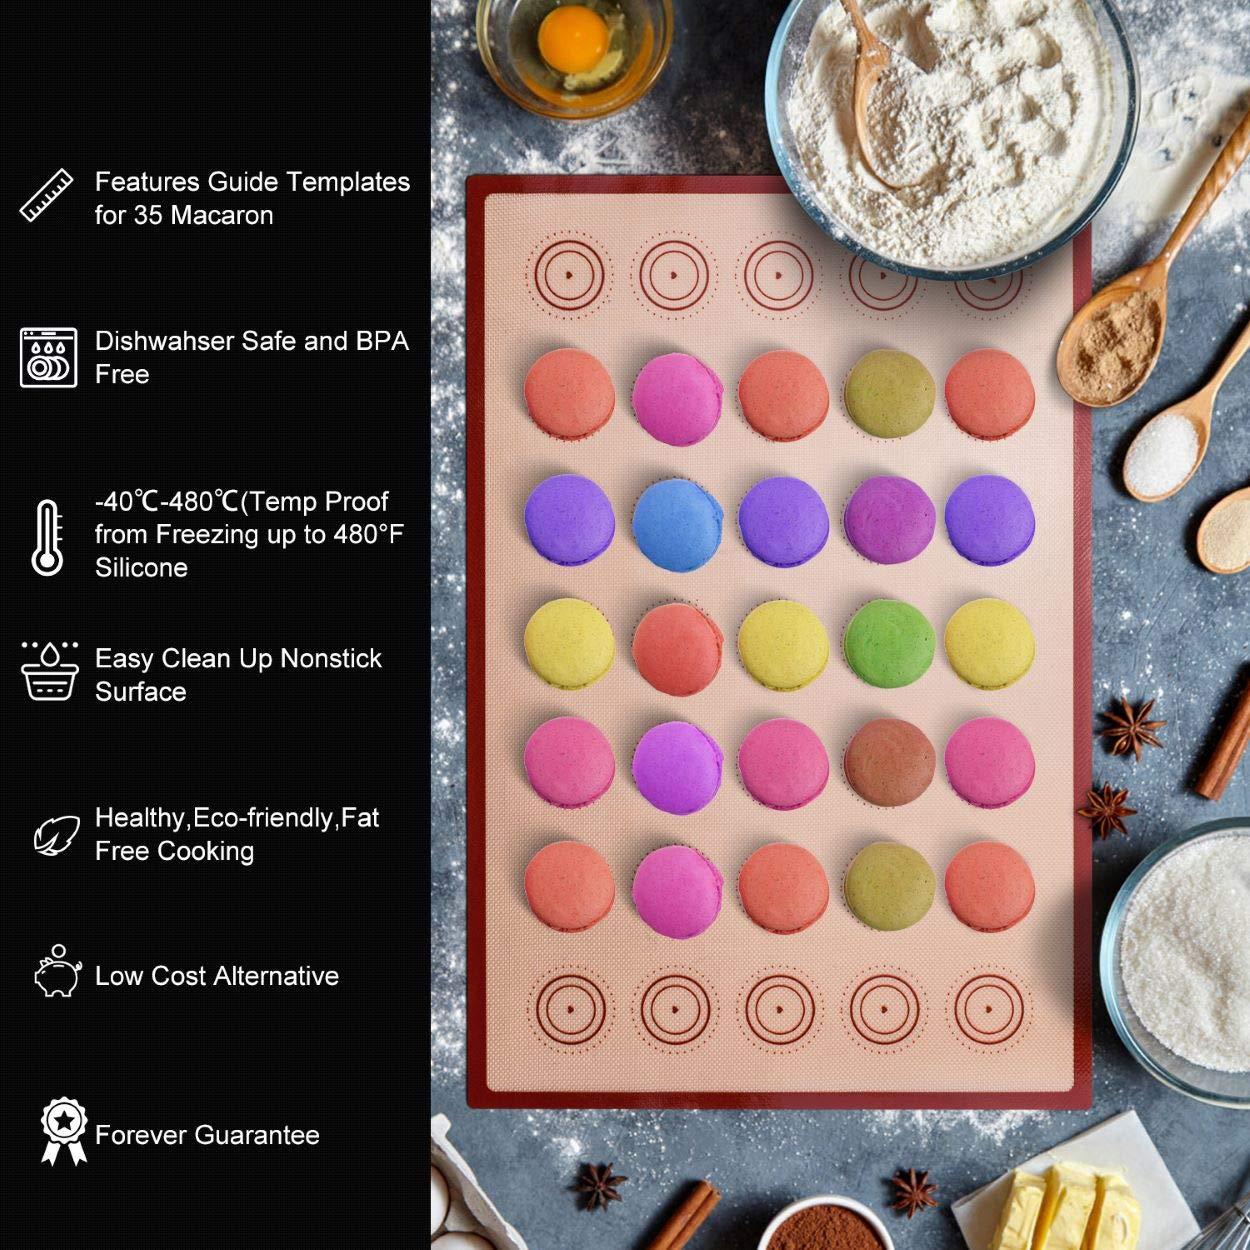 Silicone Baking Mat Macaron Mat Kit(14pcs set) Macaroon Baking Mat Set of 2 Half Sheet Macaron Silicone Mat Nonstick Macaron Mat Sheet,6 Piping Tip,2 Piping Bag with 2 Bag Tie,1 coupler (11.6''x16.5'') by Angadona (Image #2)